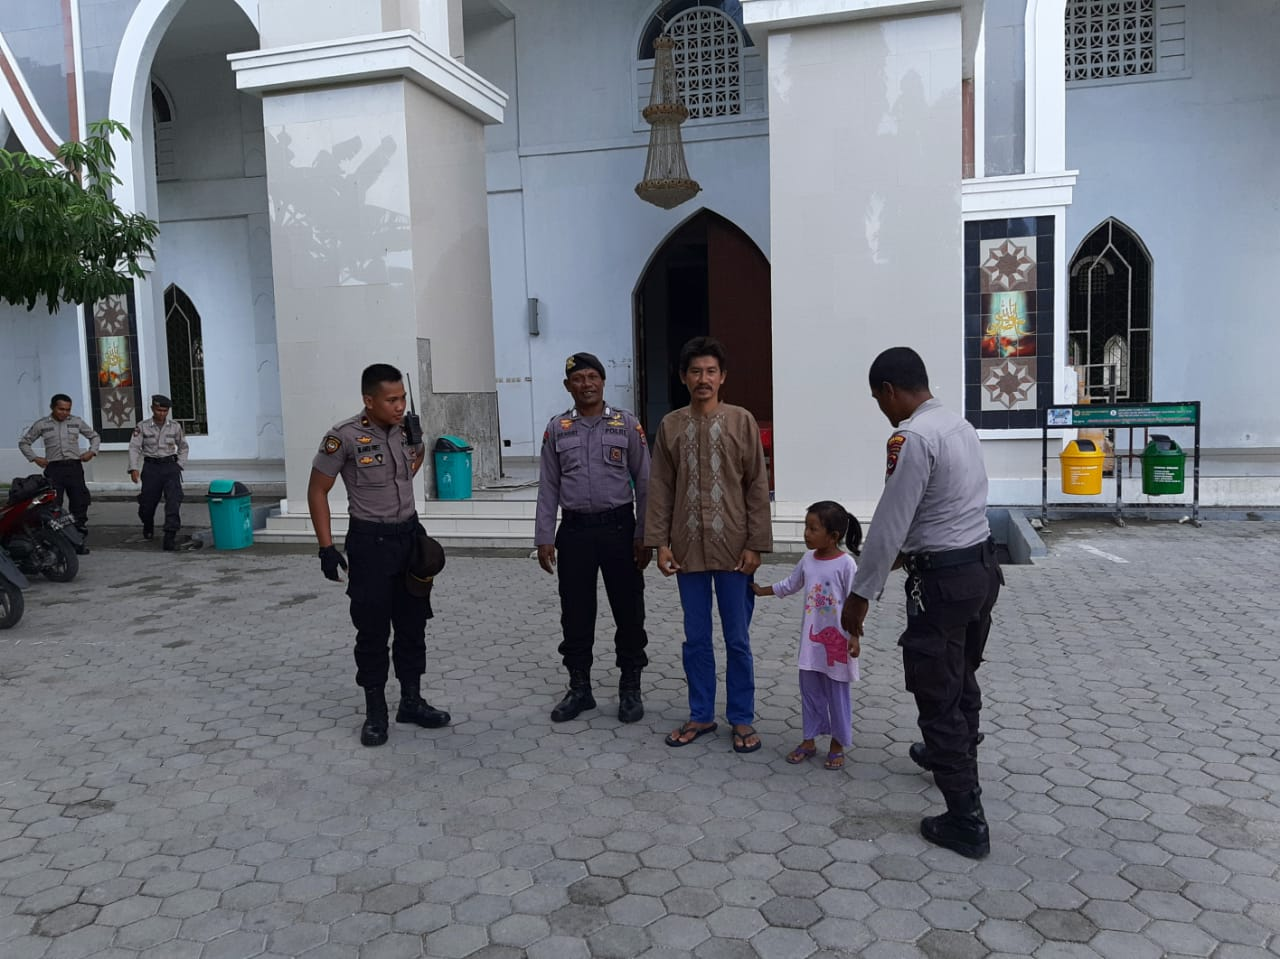 Satuan Sabhara Polres Kupang Kota Sambang Masjid Nurussa'adah Kota Kupang